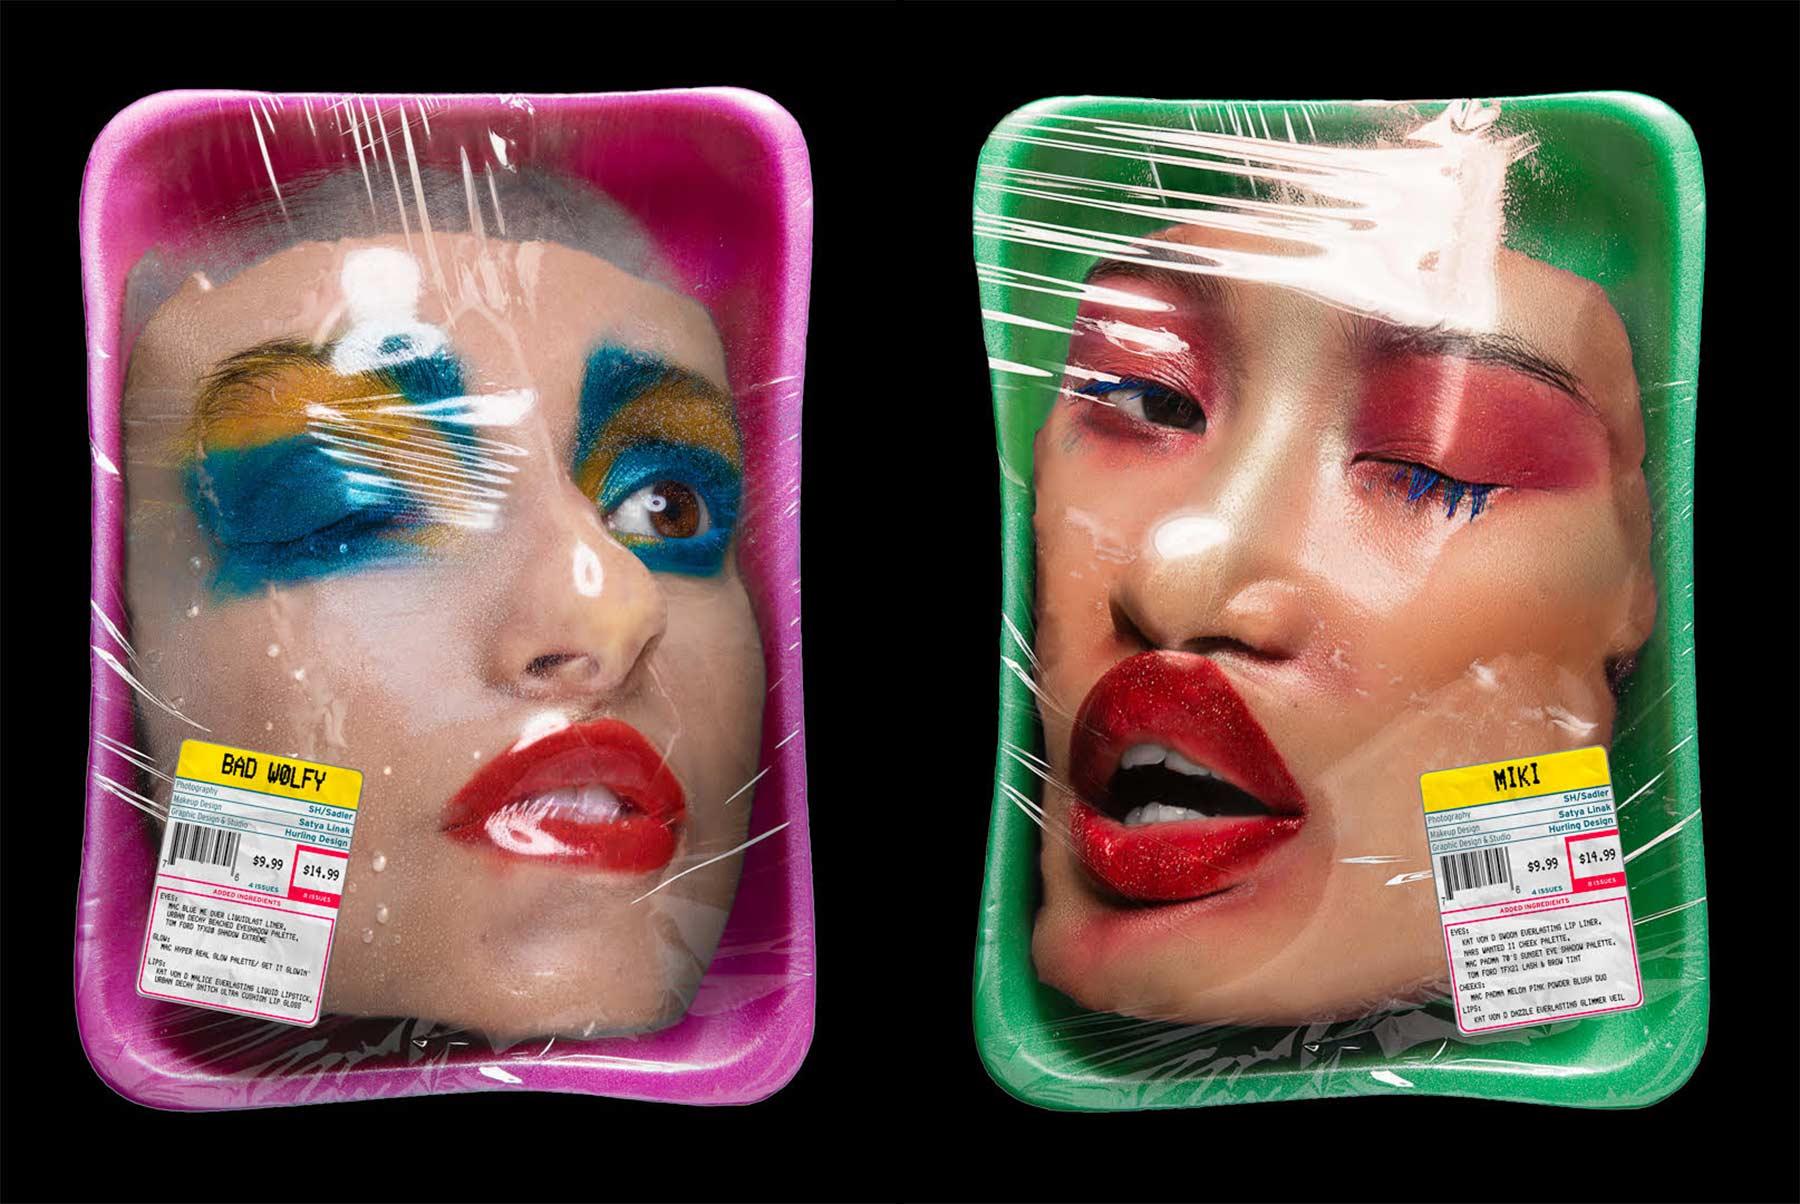 Frisch abgepackte Model-Gesichter fresh-meat-SHSadler_01